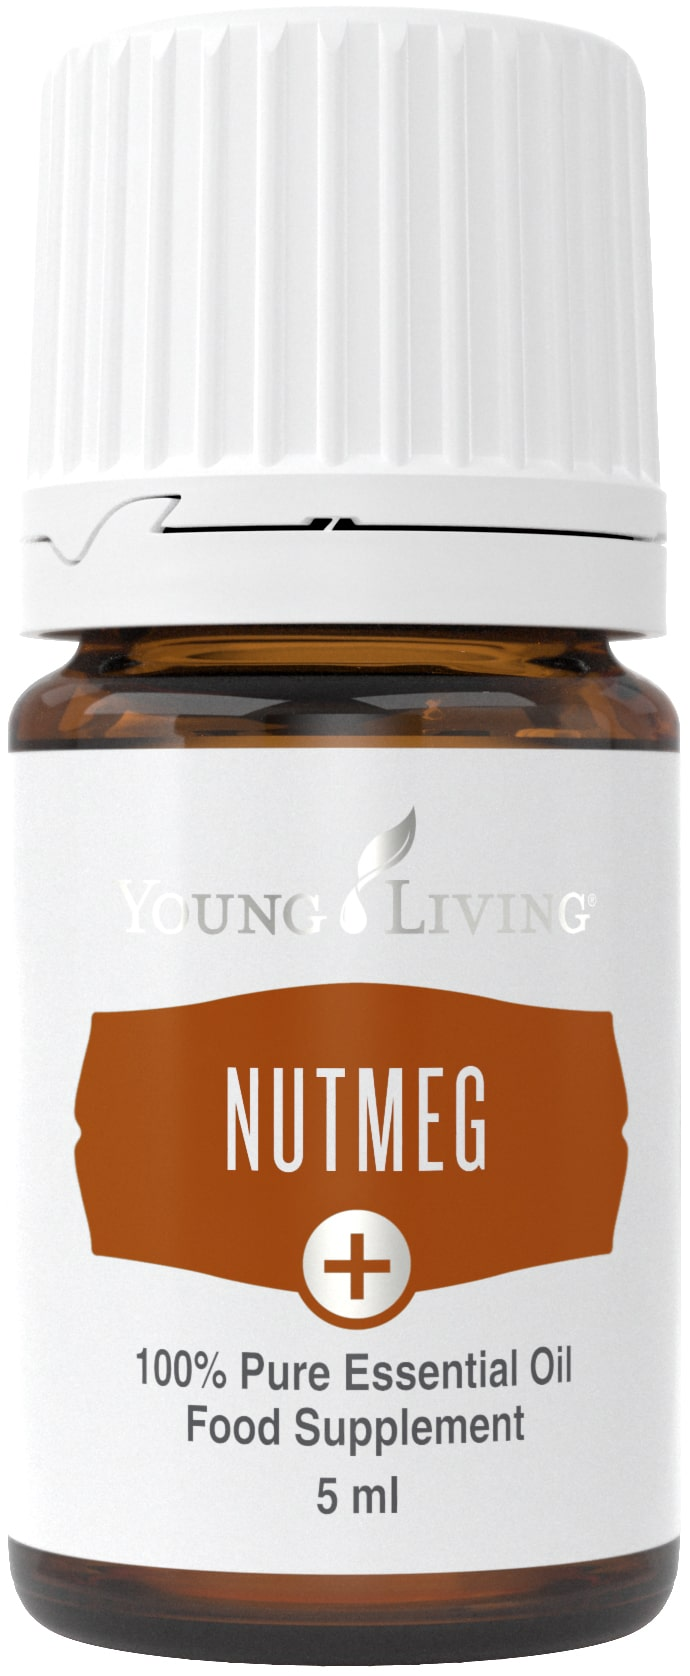 Muskat Plus Öl (Nutmeg) 5ml